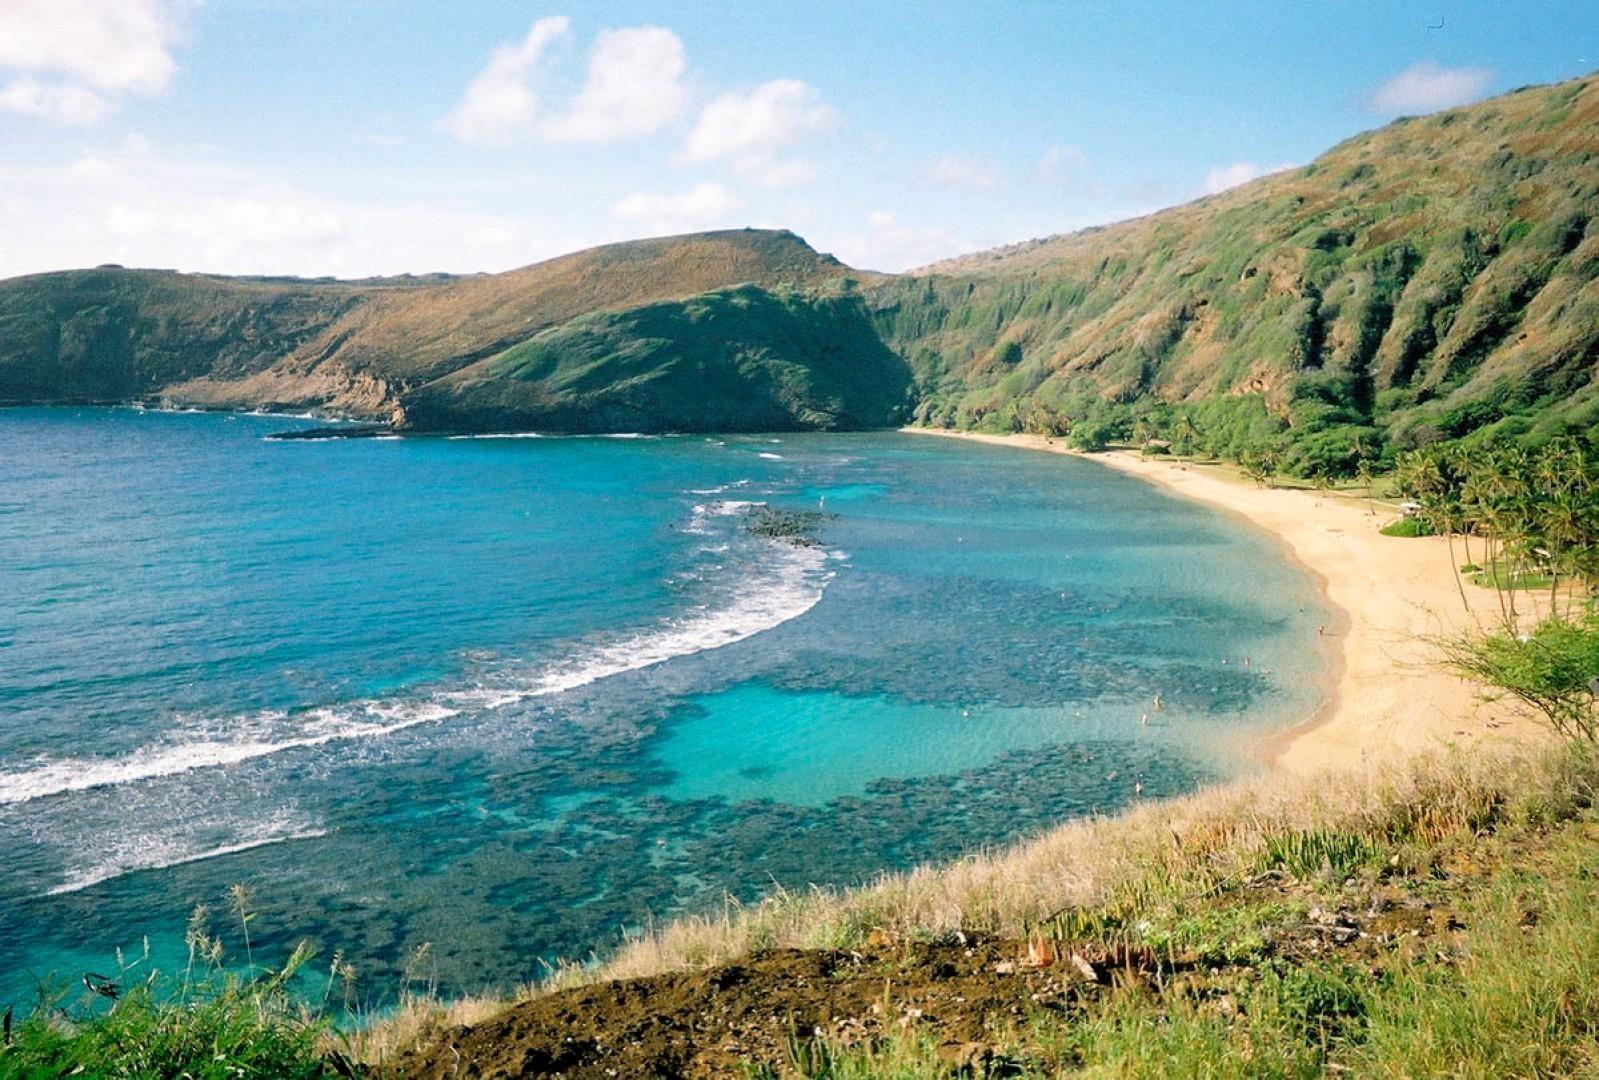 Beaches like world-famous Hanauma Bay are only a short drive away!